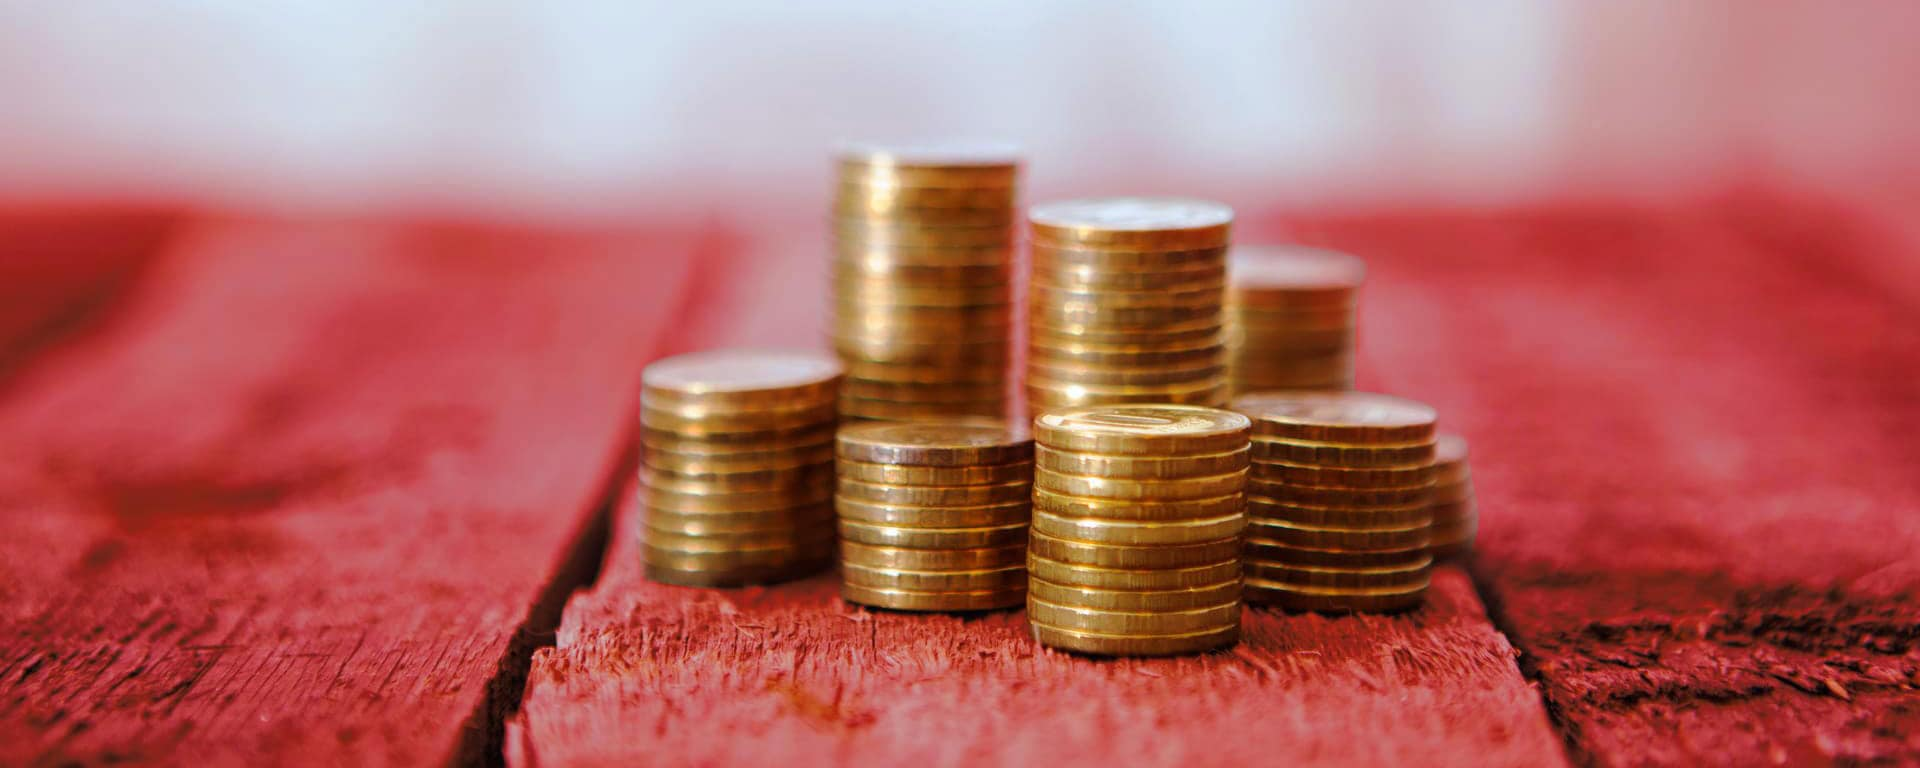 business decision management blog image - pile of coins